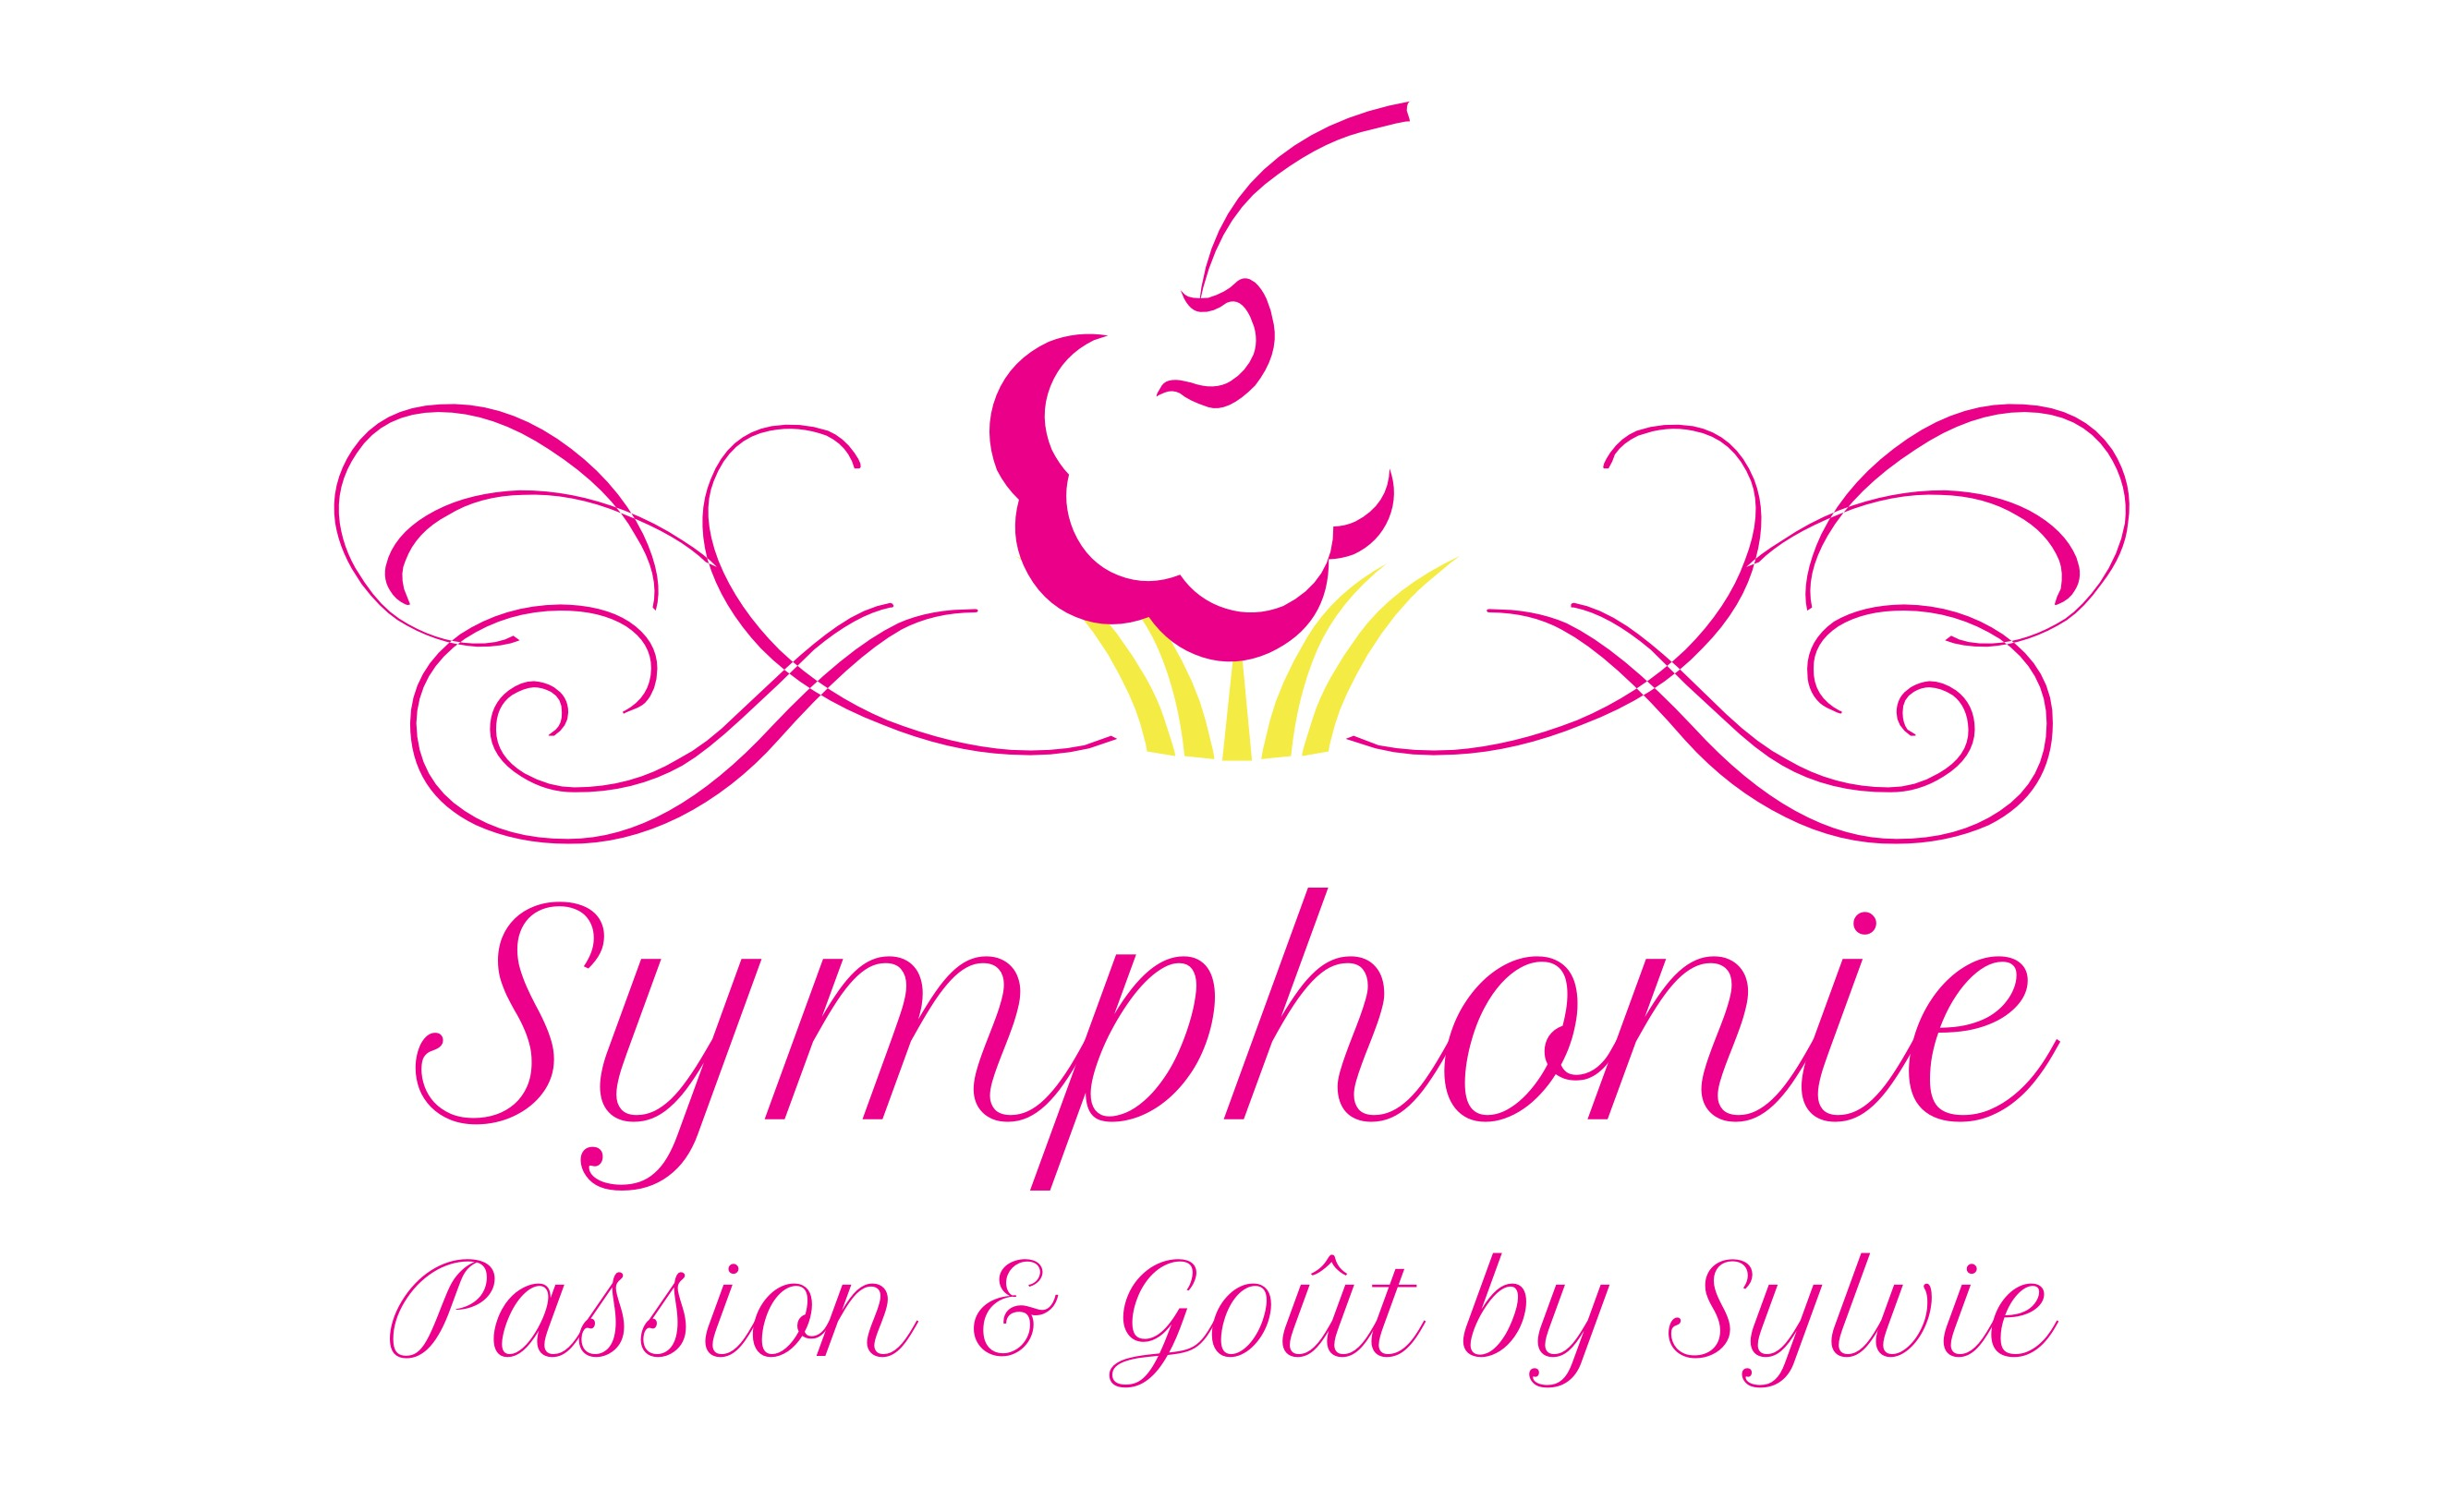 symphoniebysylvie.com